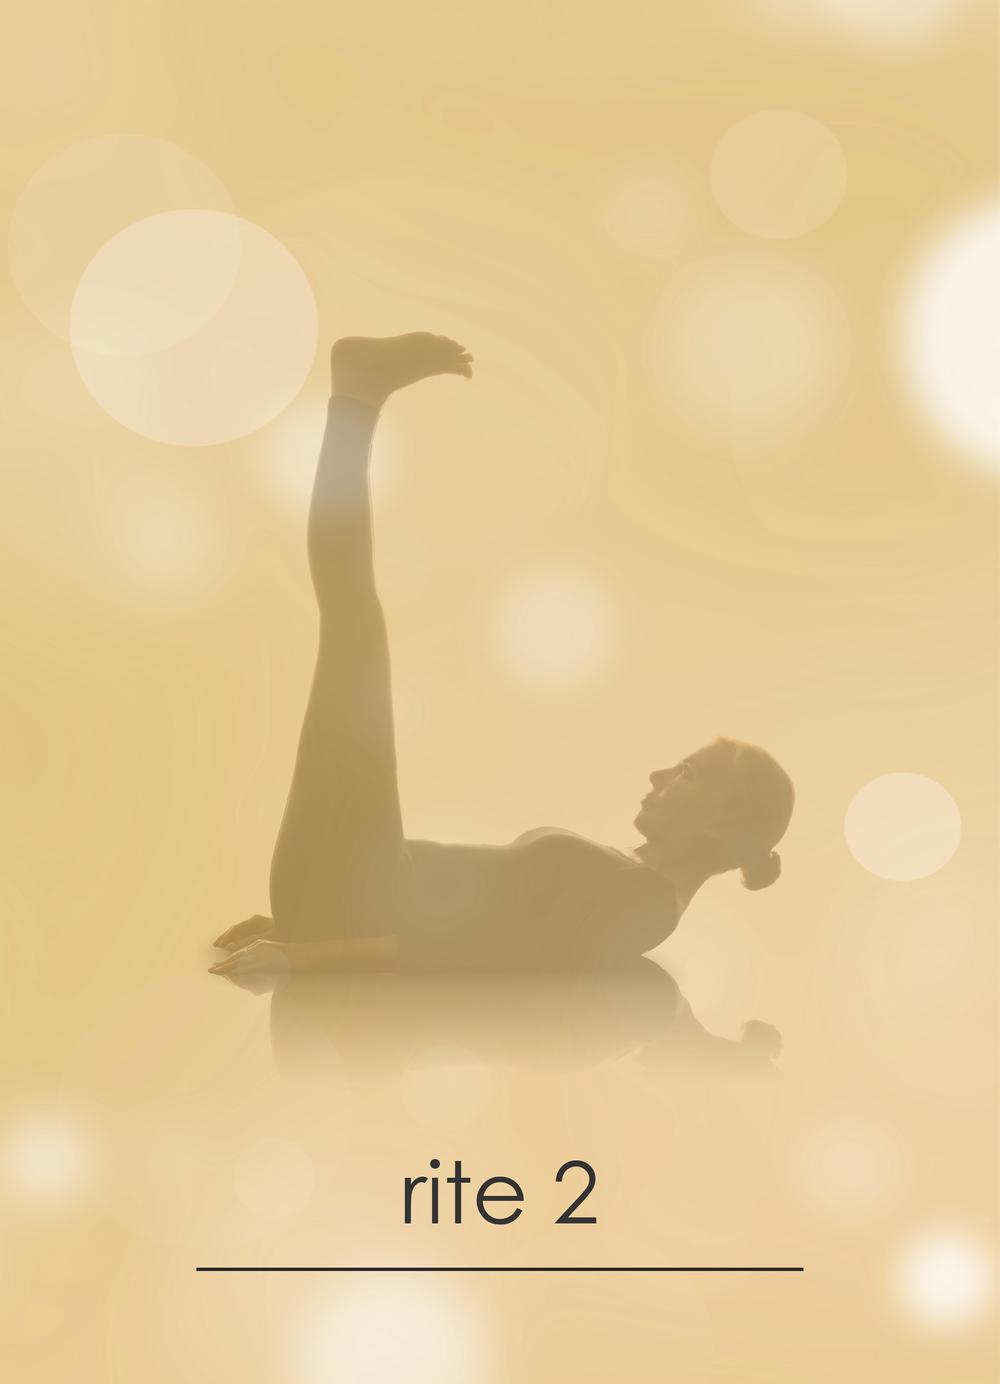 rites_for_life_yoga_rite_2e.jpg